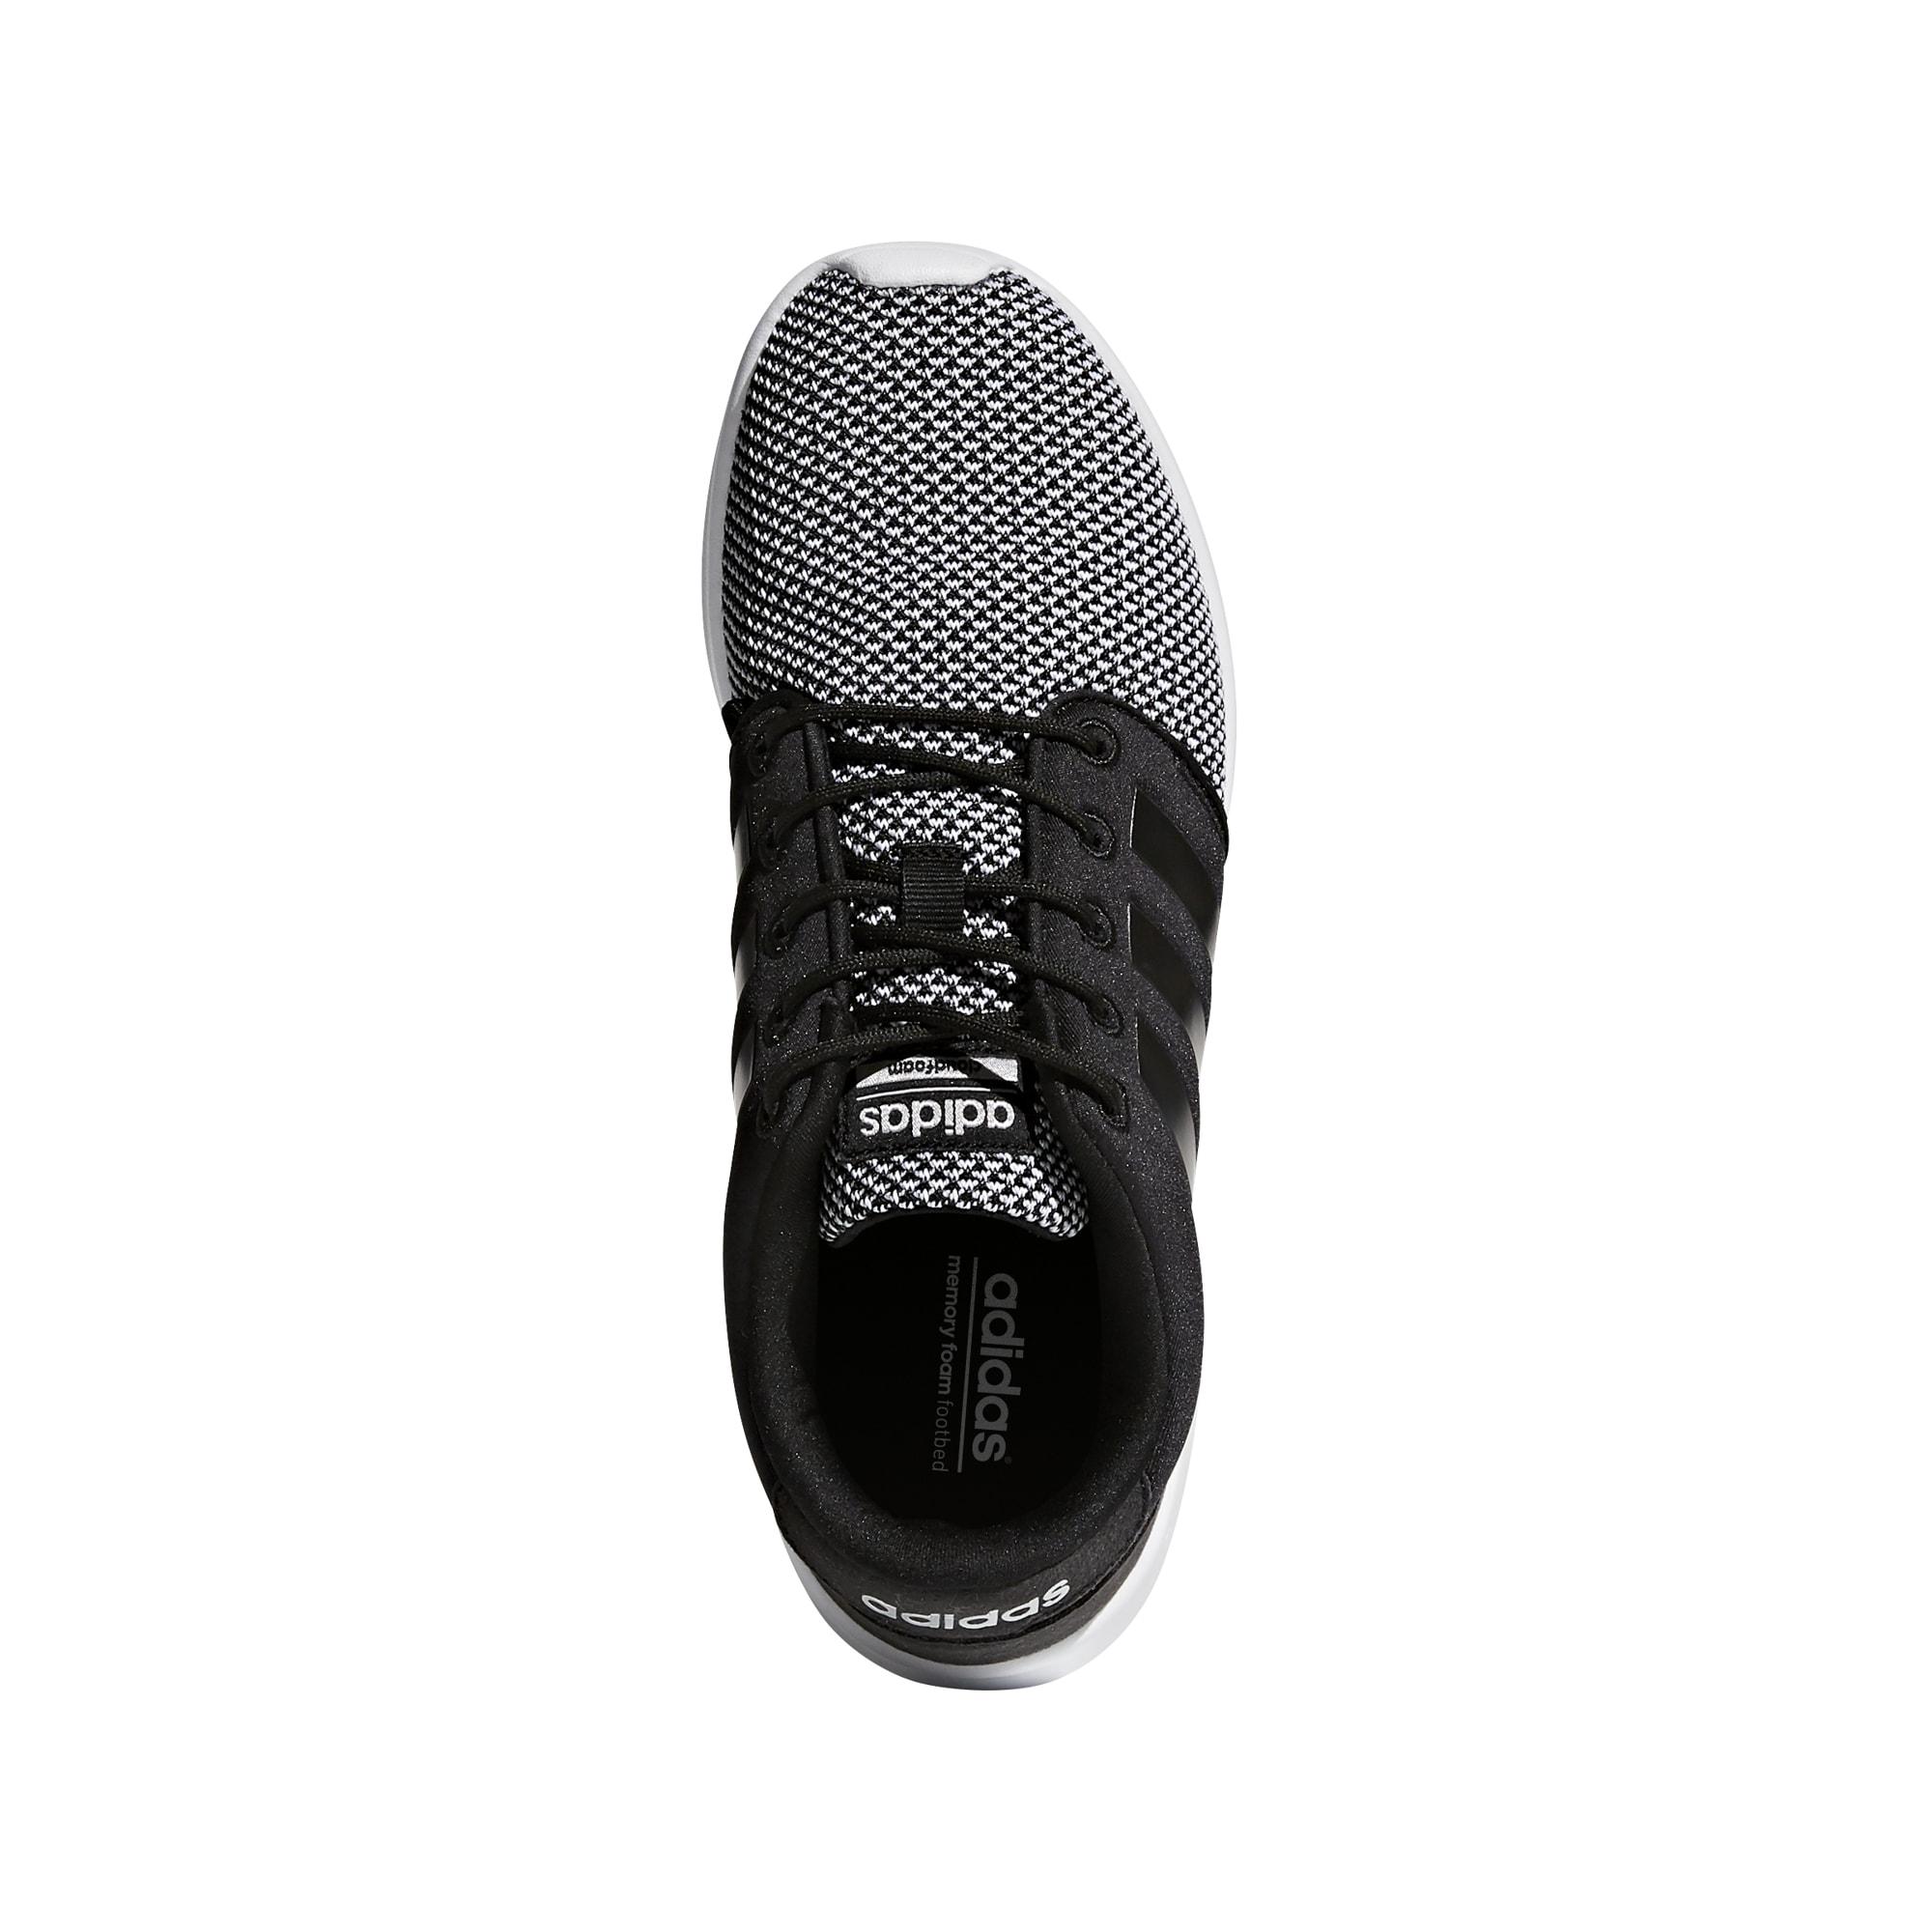 Adidas Cloudfoam QT Racer joggesko Core blackmatte silver Tights.no